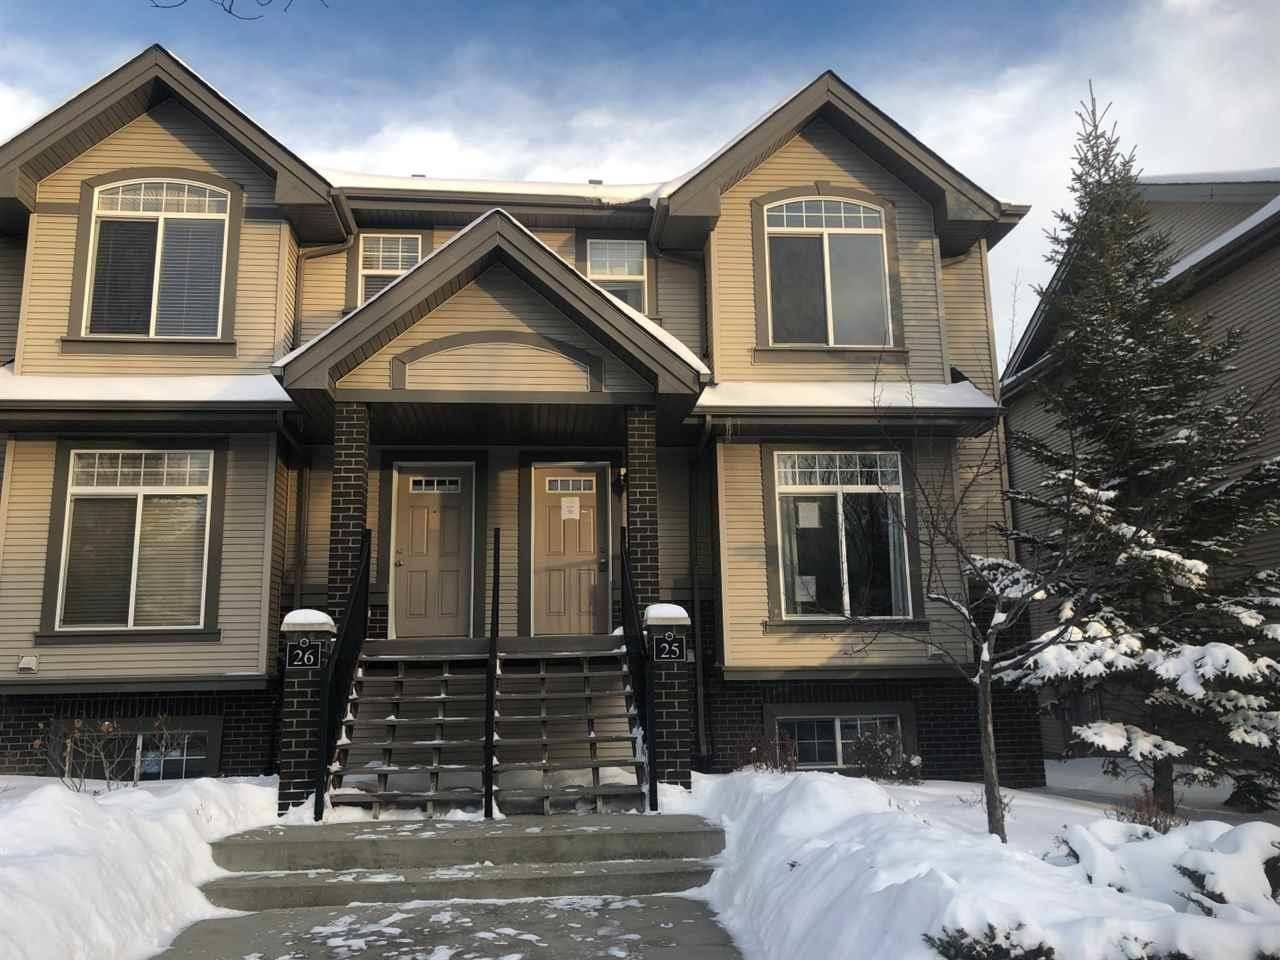 Townhouse for sale at 4755 Terwillegar Common Nw Unit 25 Edmonton Alberta - MLS: E4185249